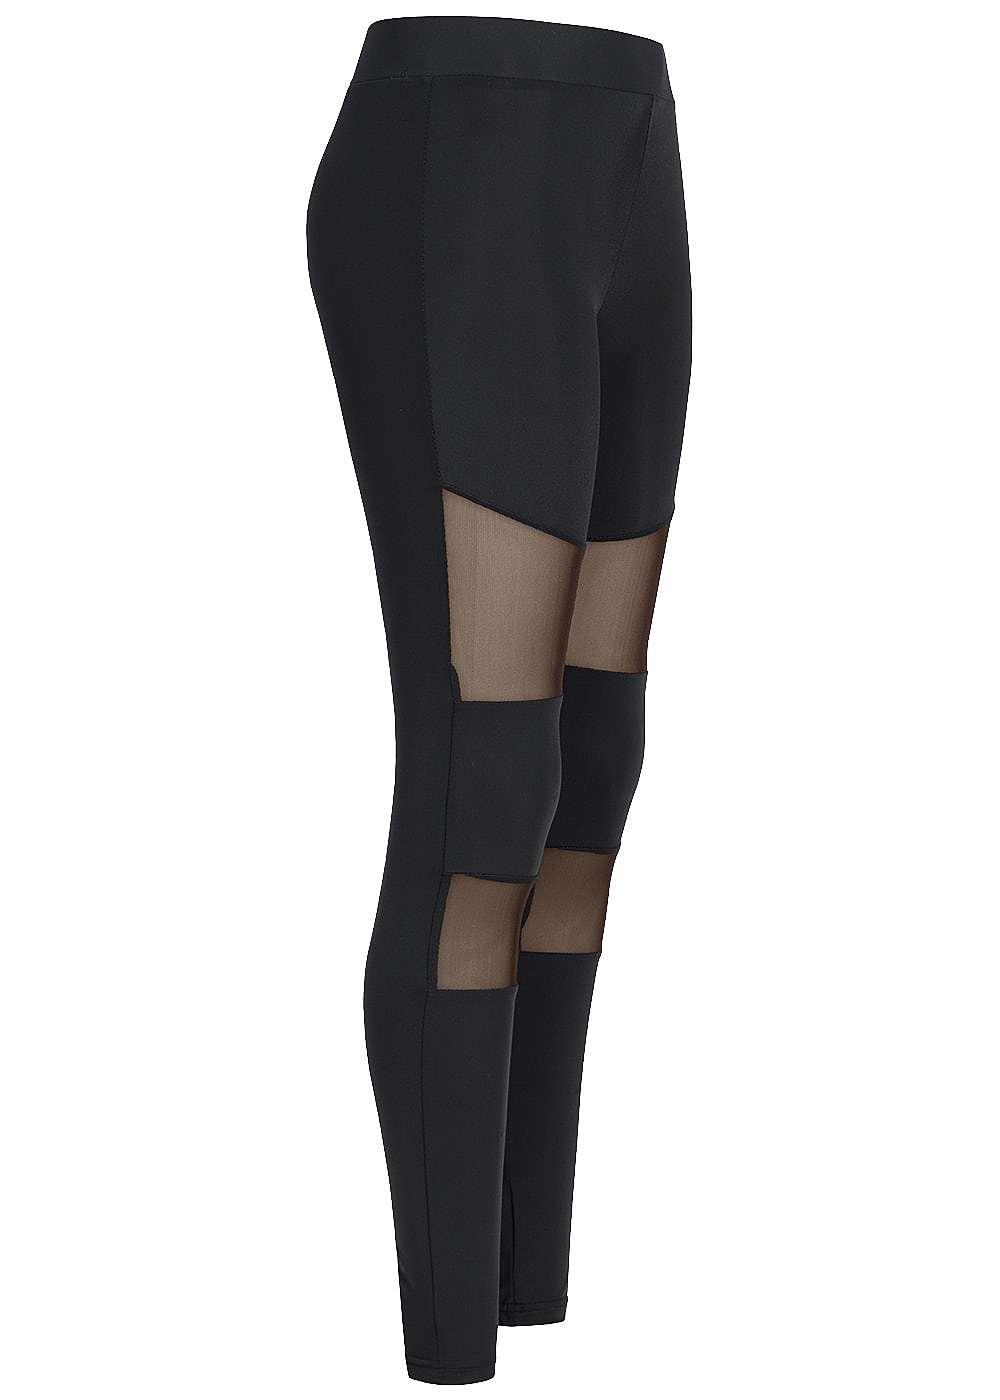 seventyseven lifestyle damen leggings gummibund mesh schwarz 77onlineshop. Black Bedroom Furniture Sets. Home Design Ideas